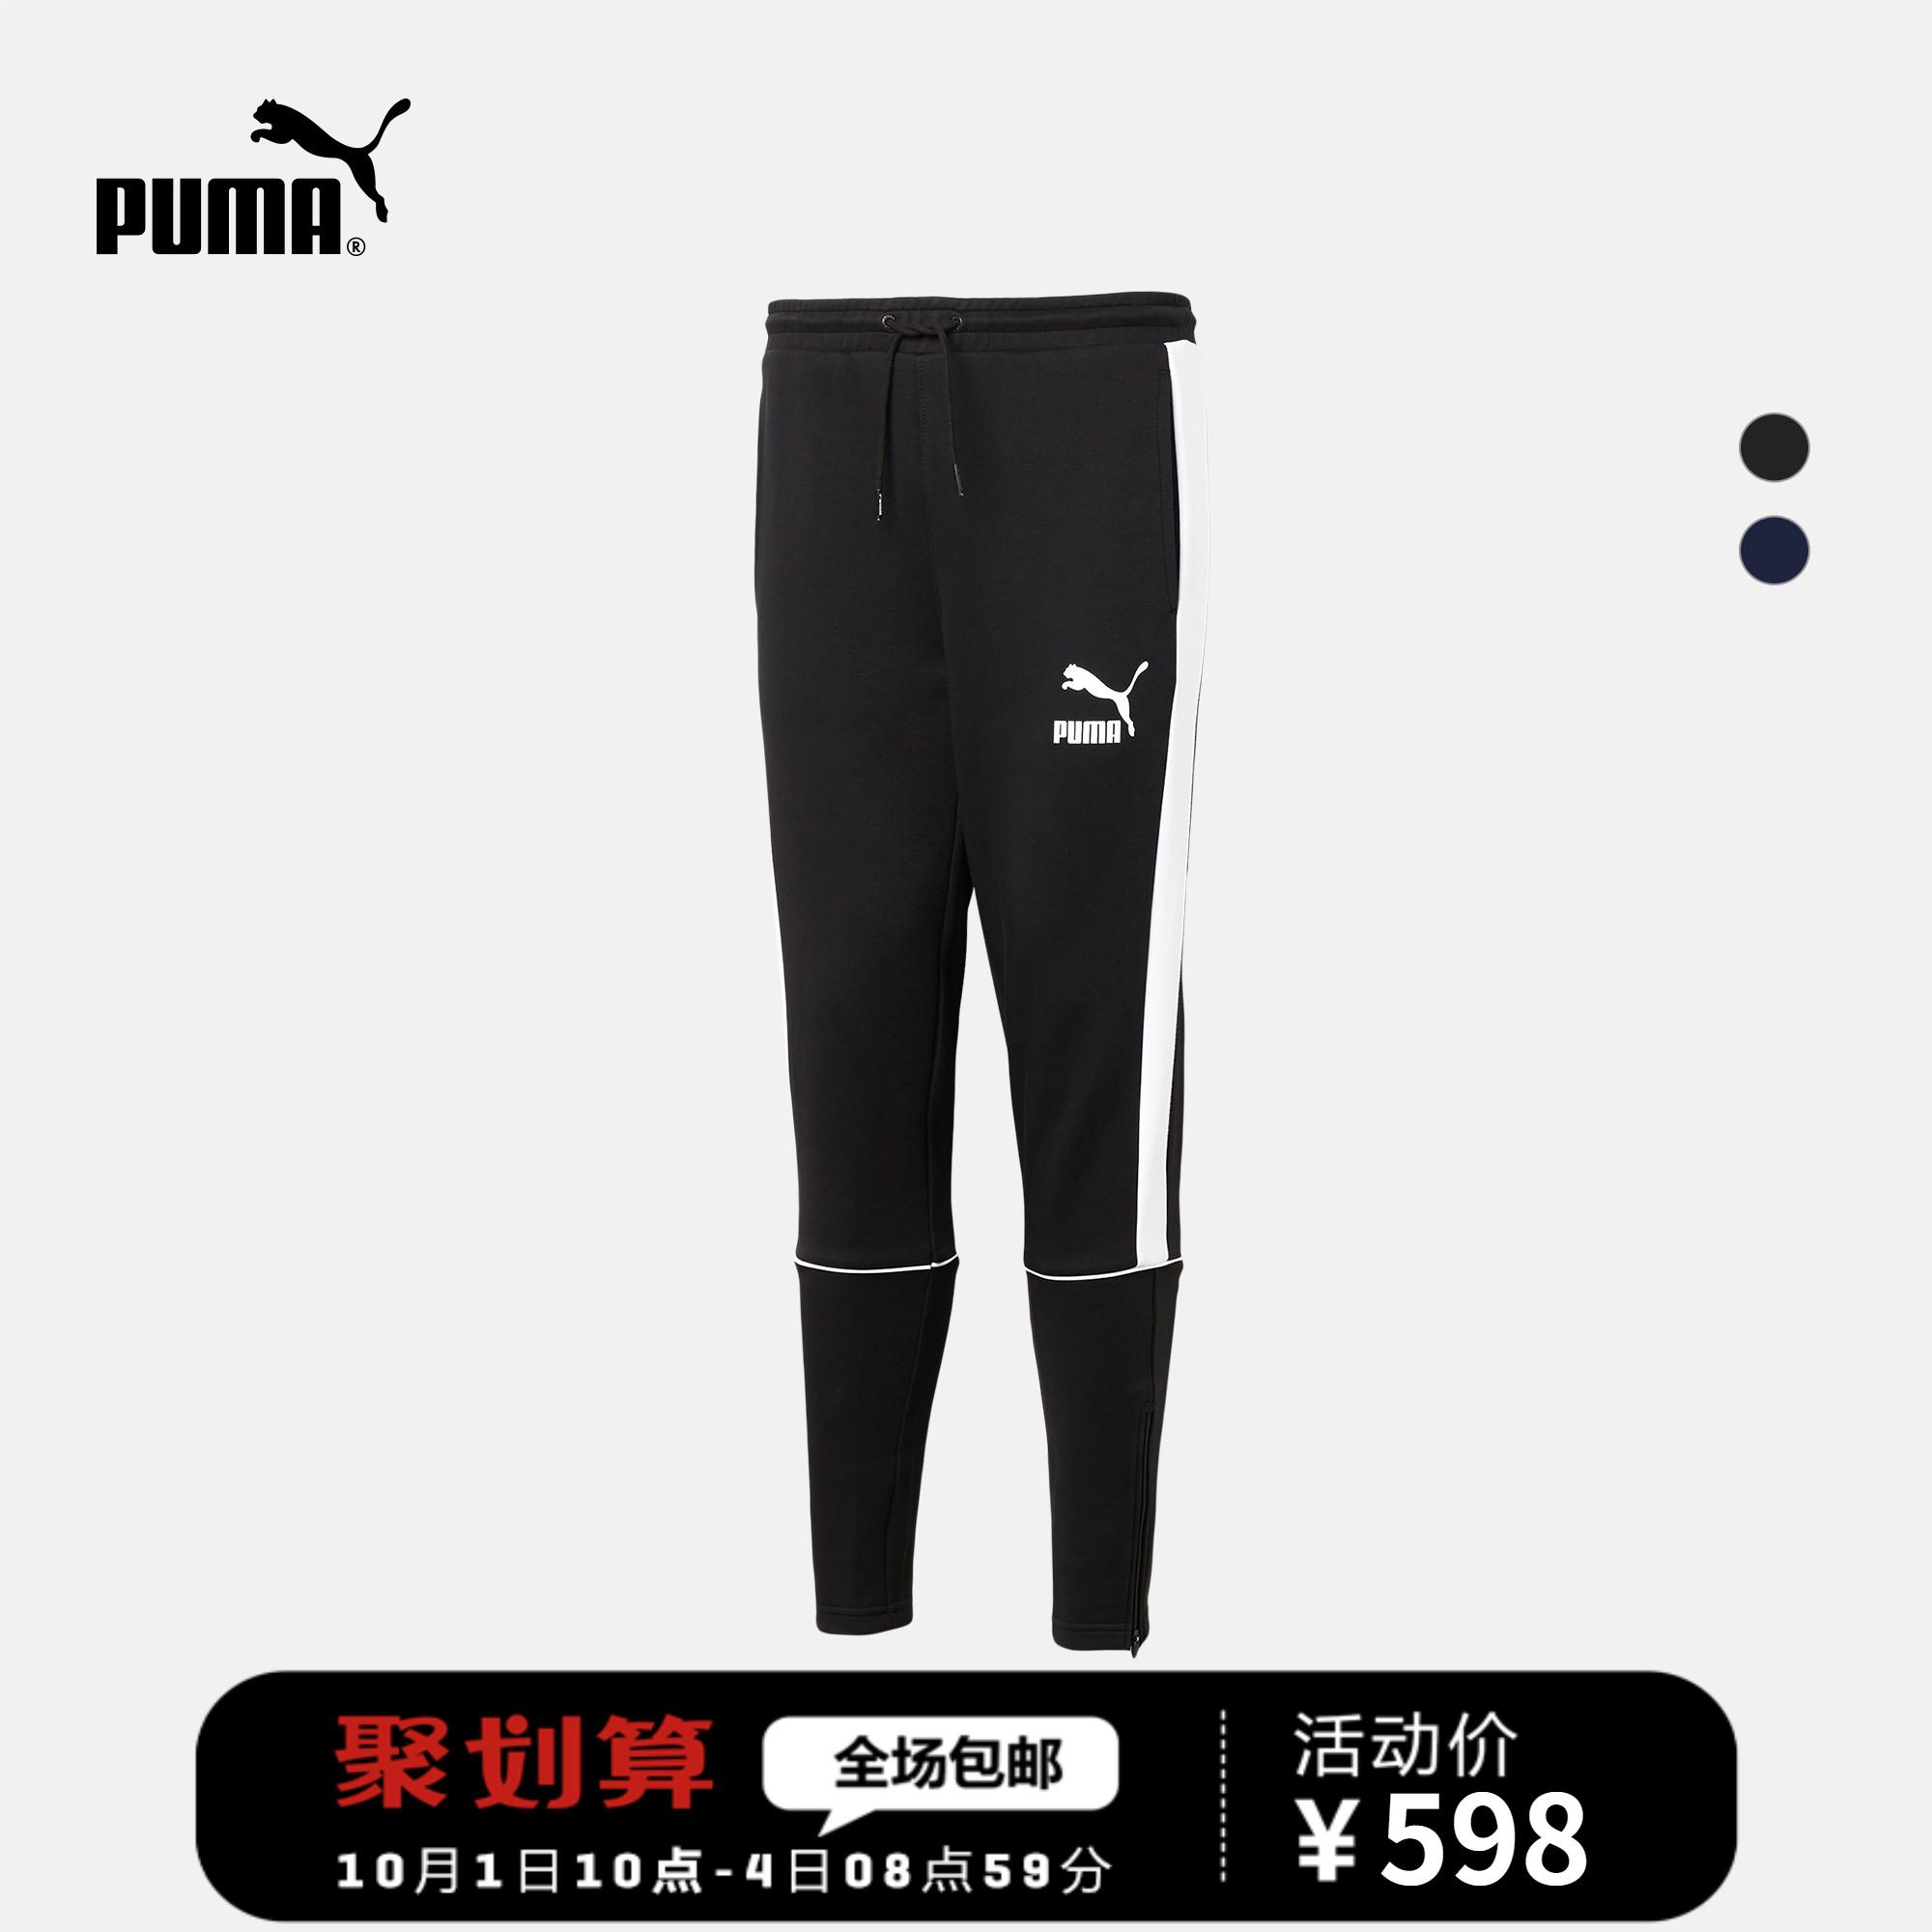 PUMA彪马官方 刘昊然同款 男子抽绳长裤 Retro 577526